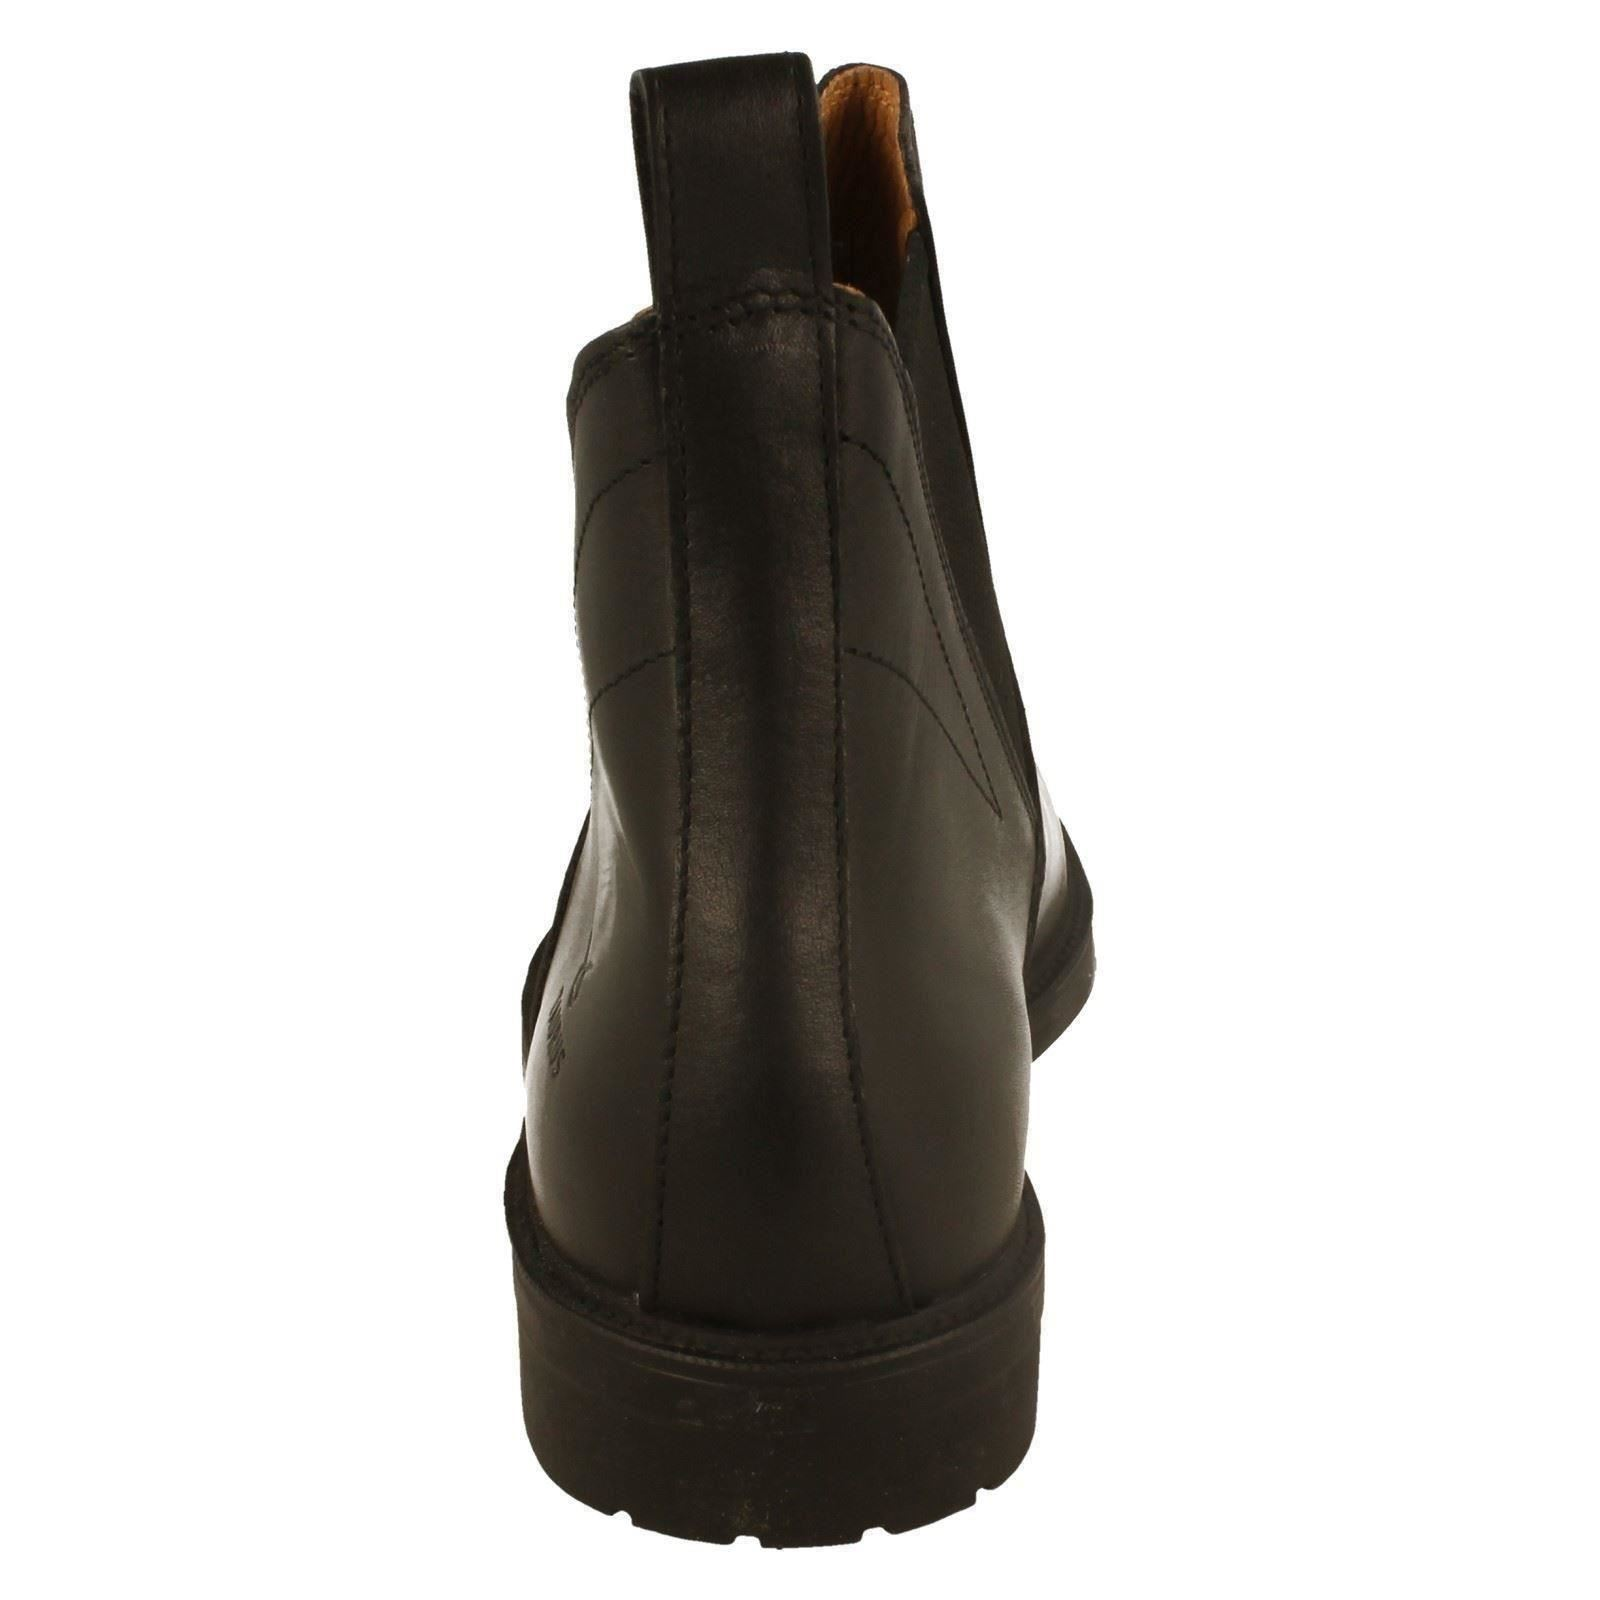 Unisex Jodphur Stiefel The The Stiefel Style Pegasus-W 6ae31d